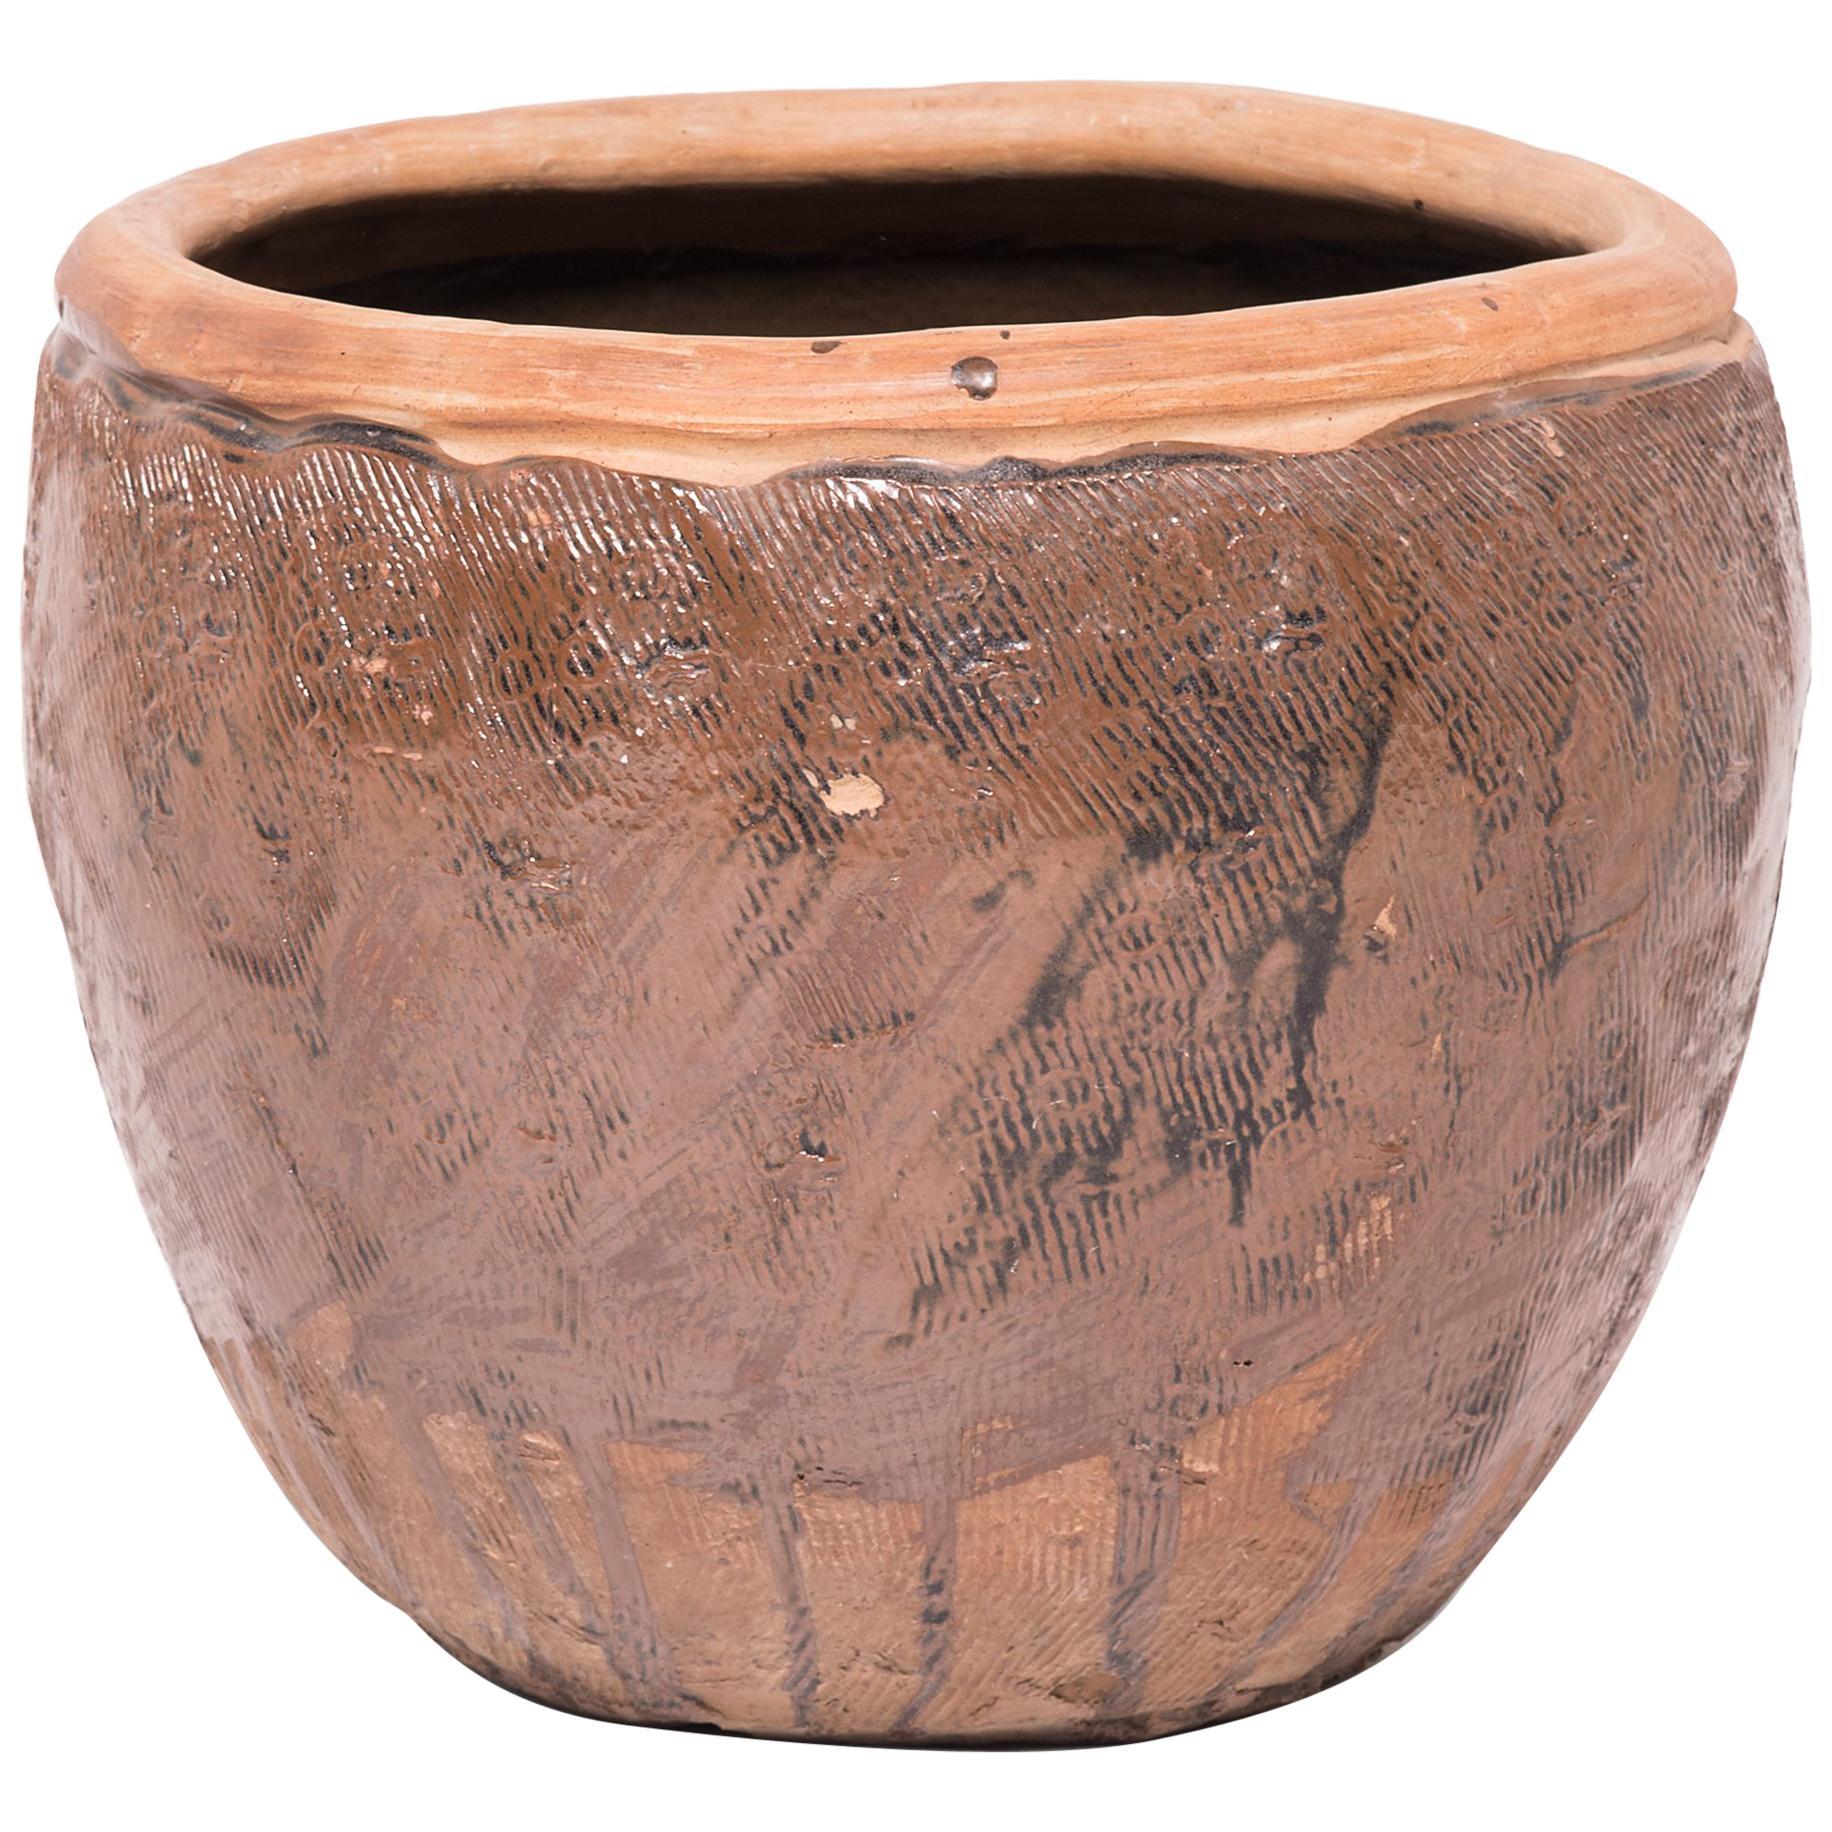 Chinese Incised Terracotta Grain Jar